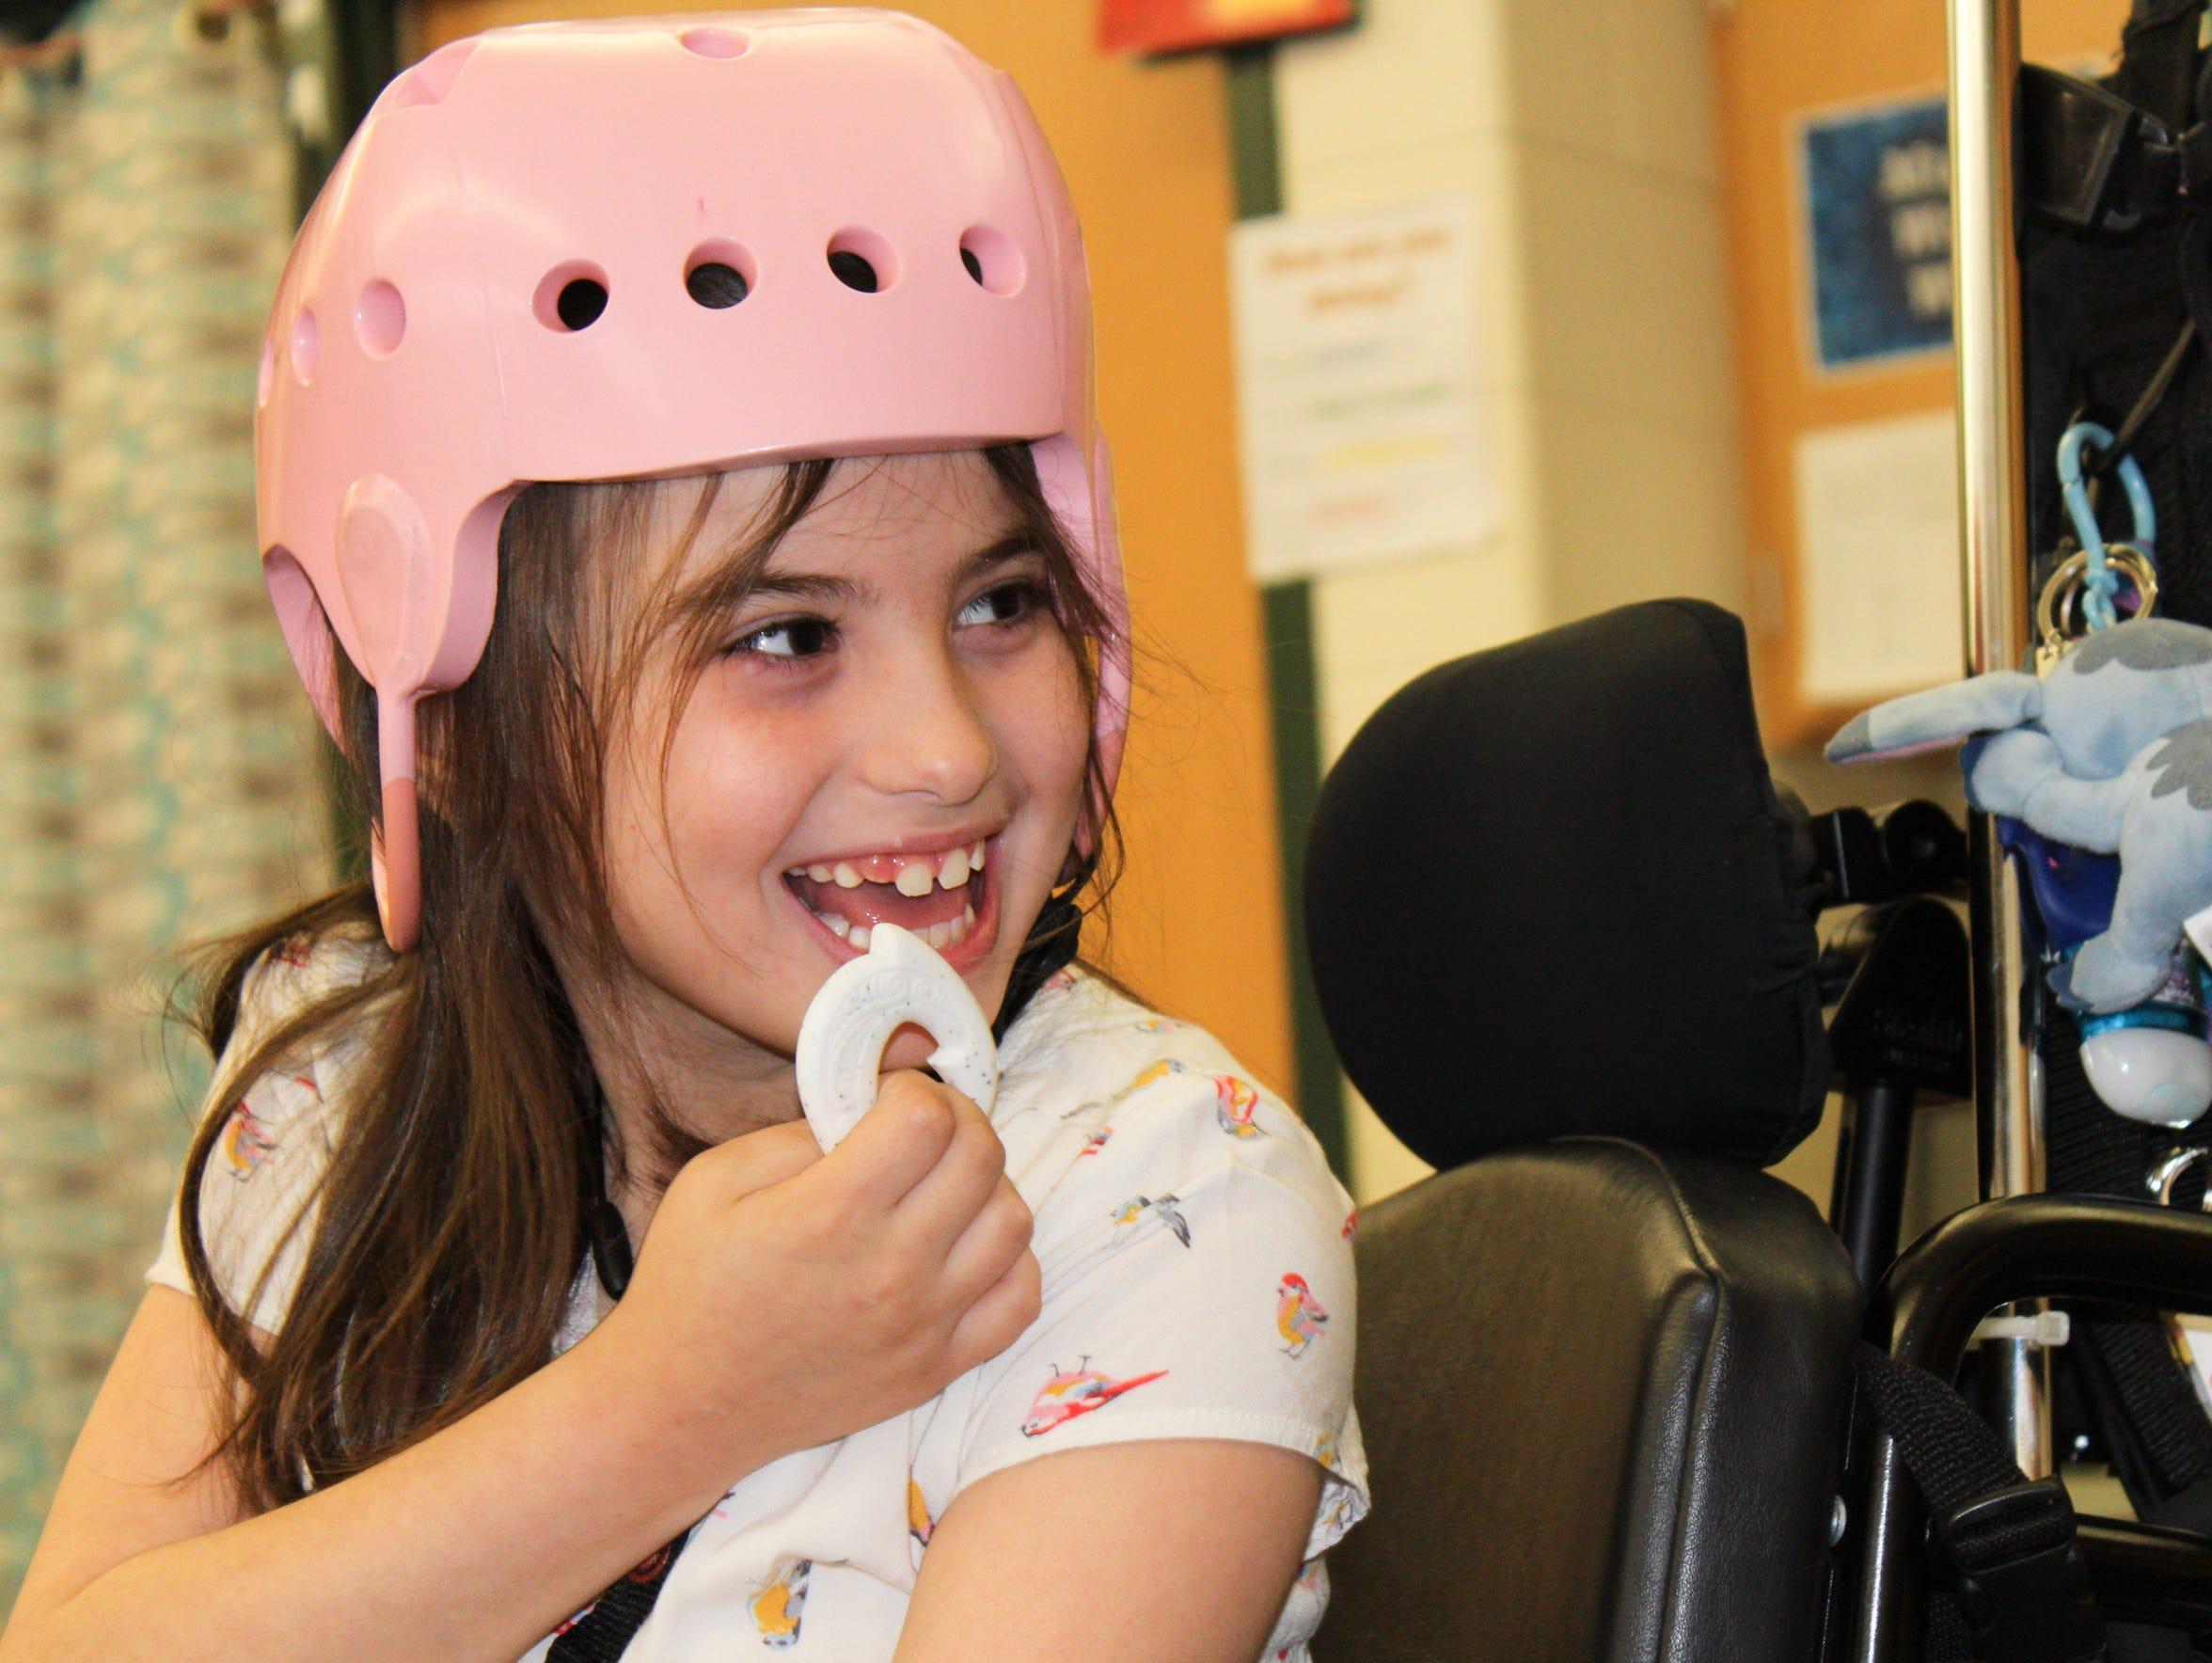 Julianna Shubert, 7, participates in music class at